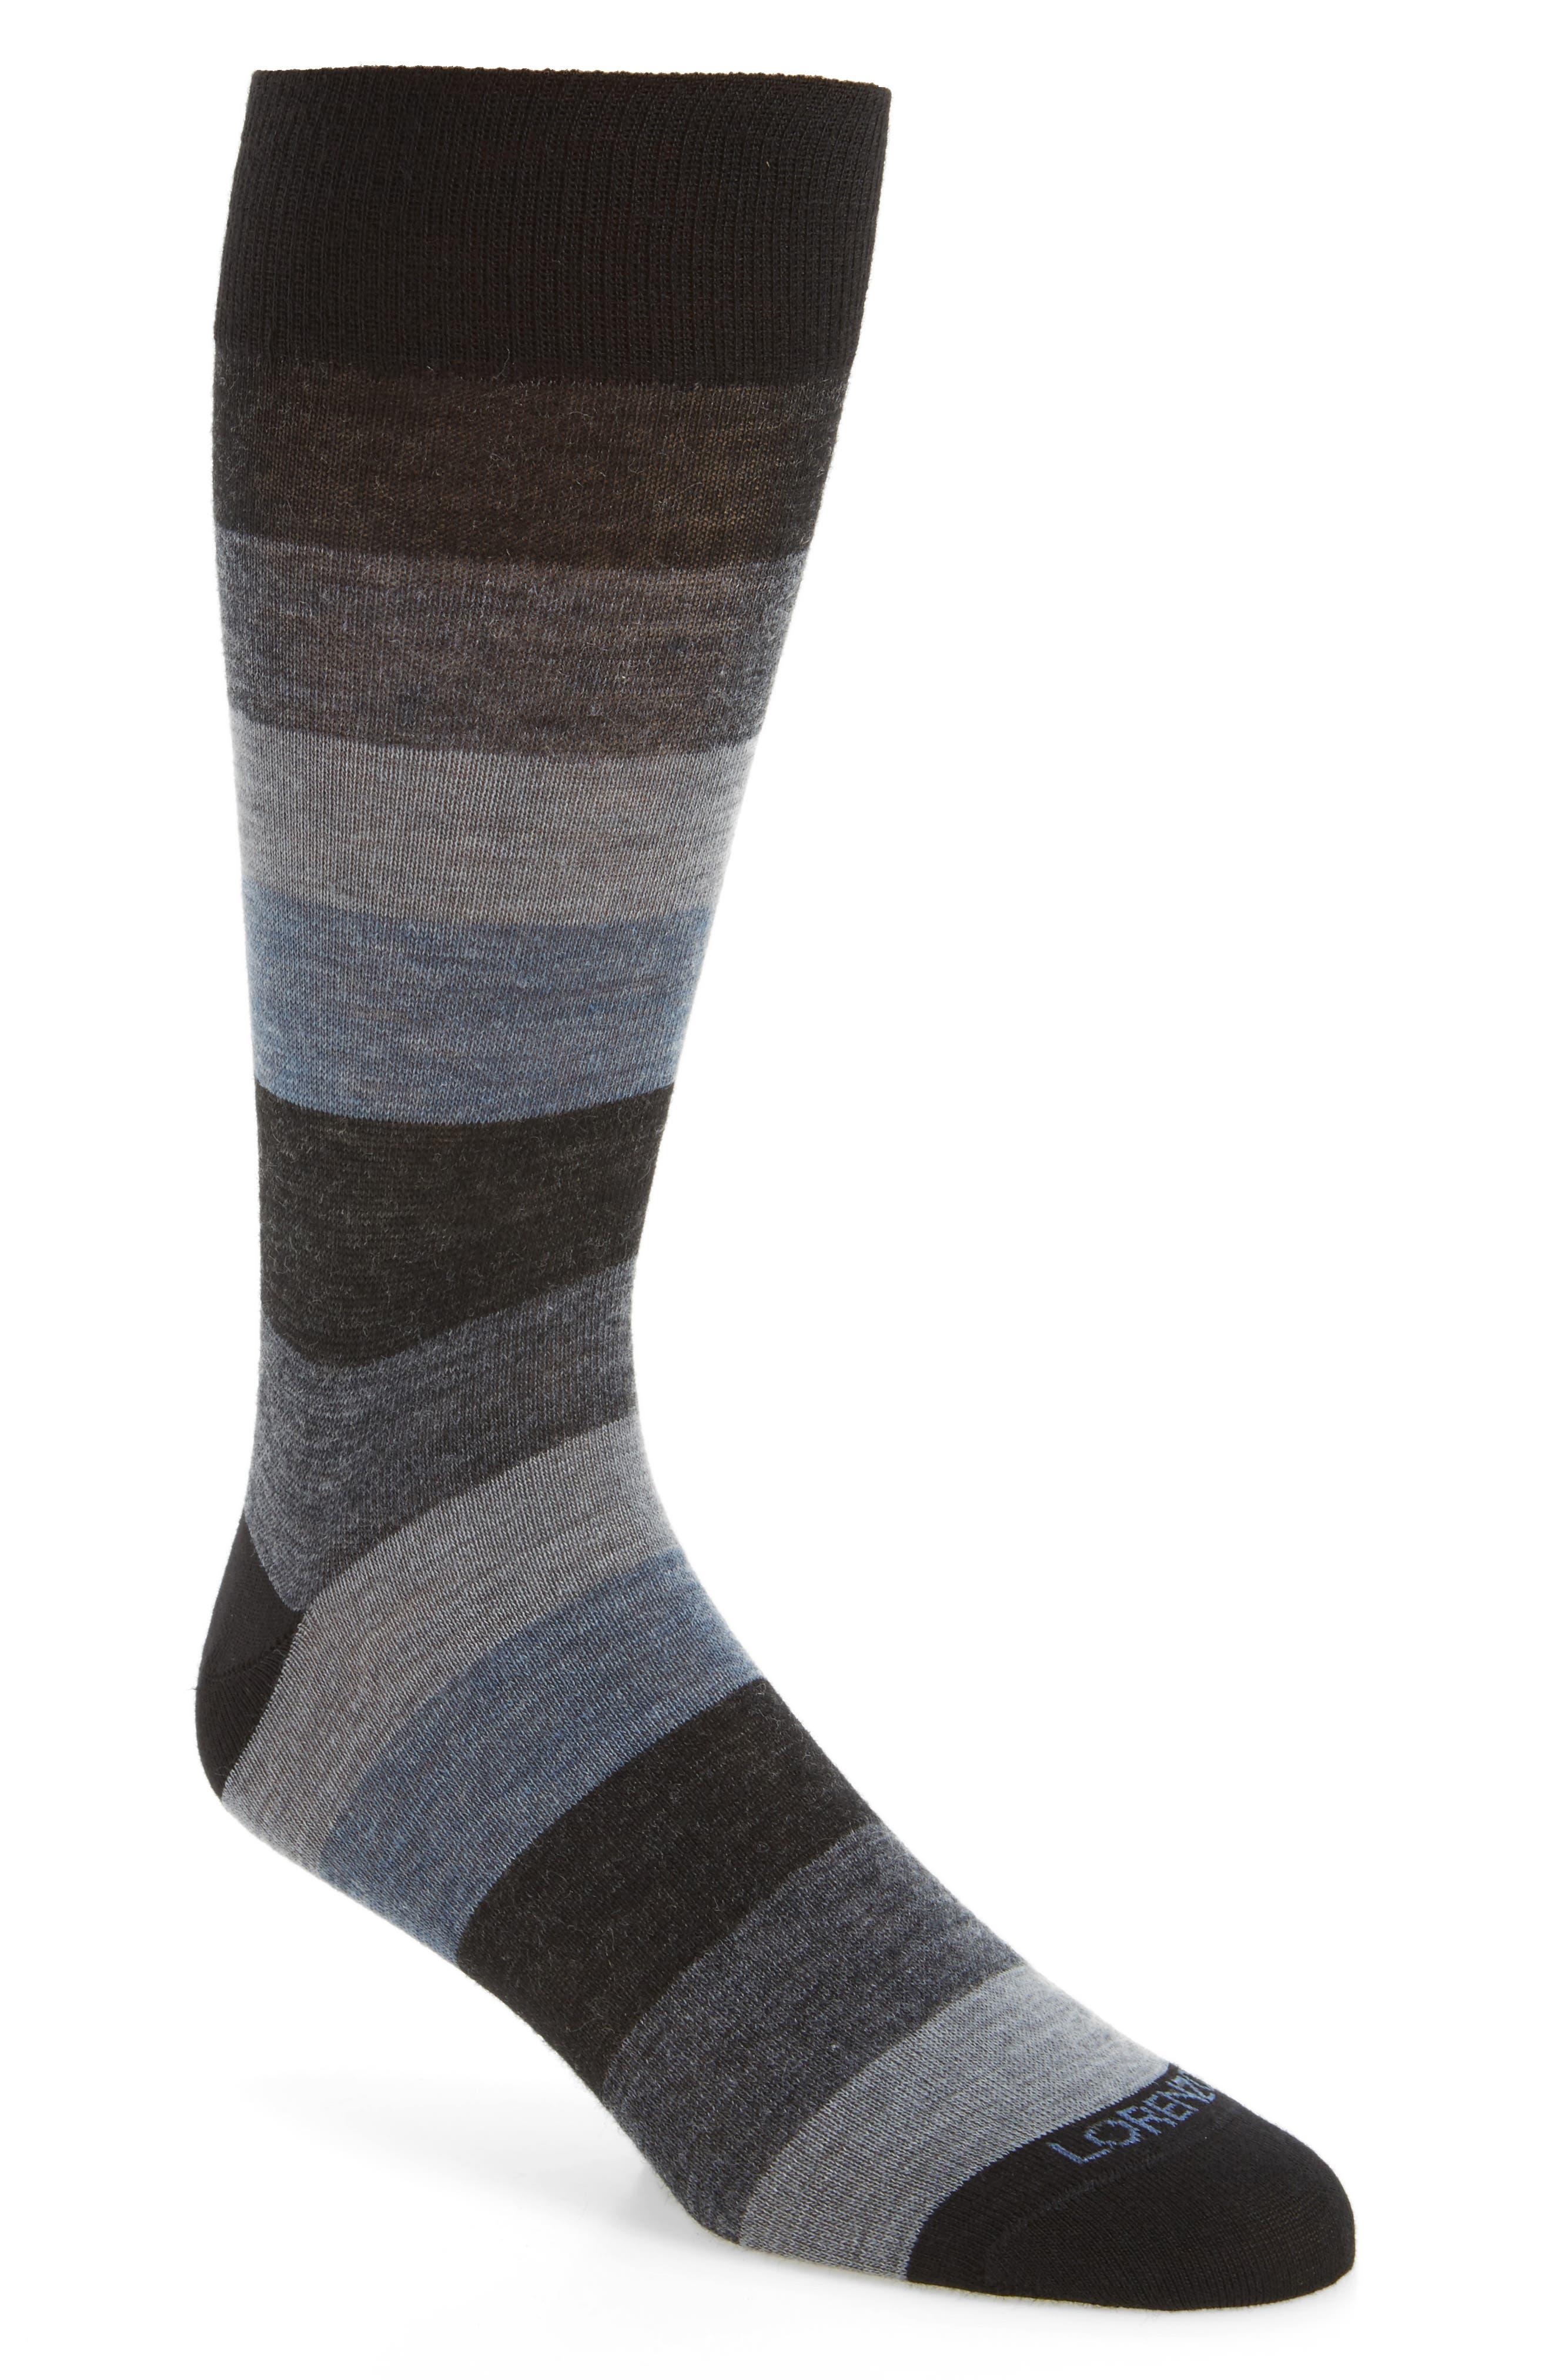 Colorblock Socks,                             Main thumbnail 1, color,                             001